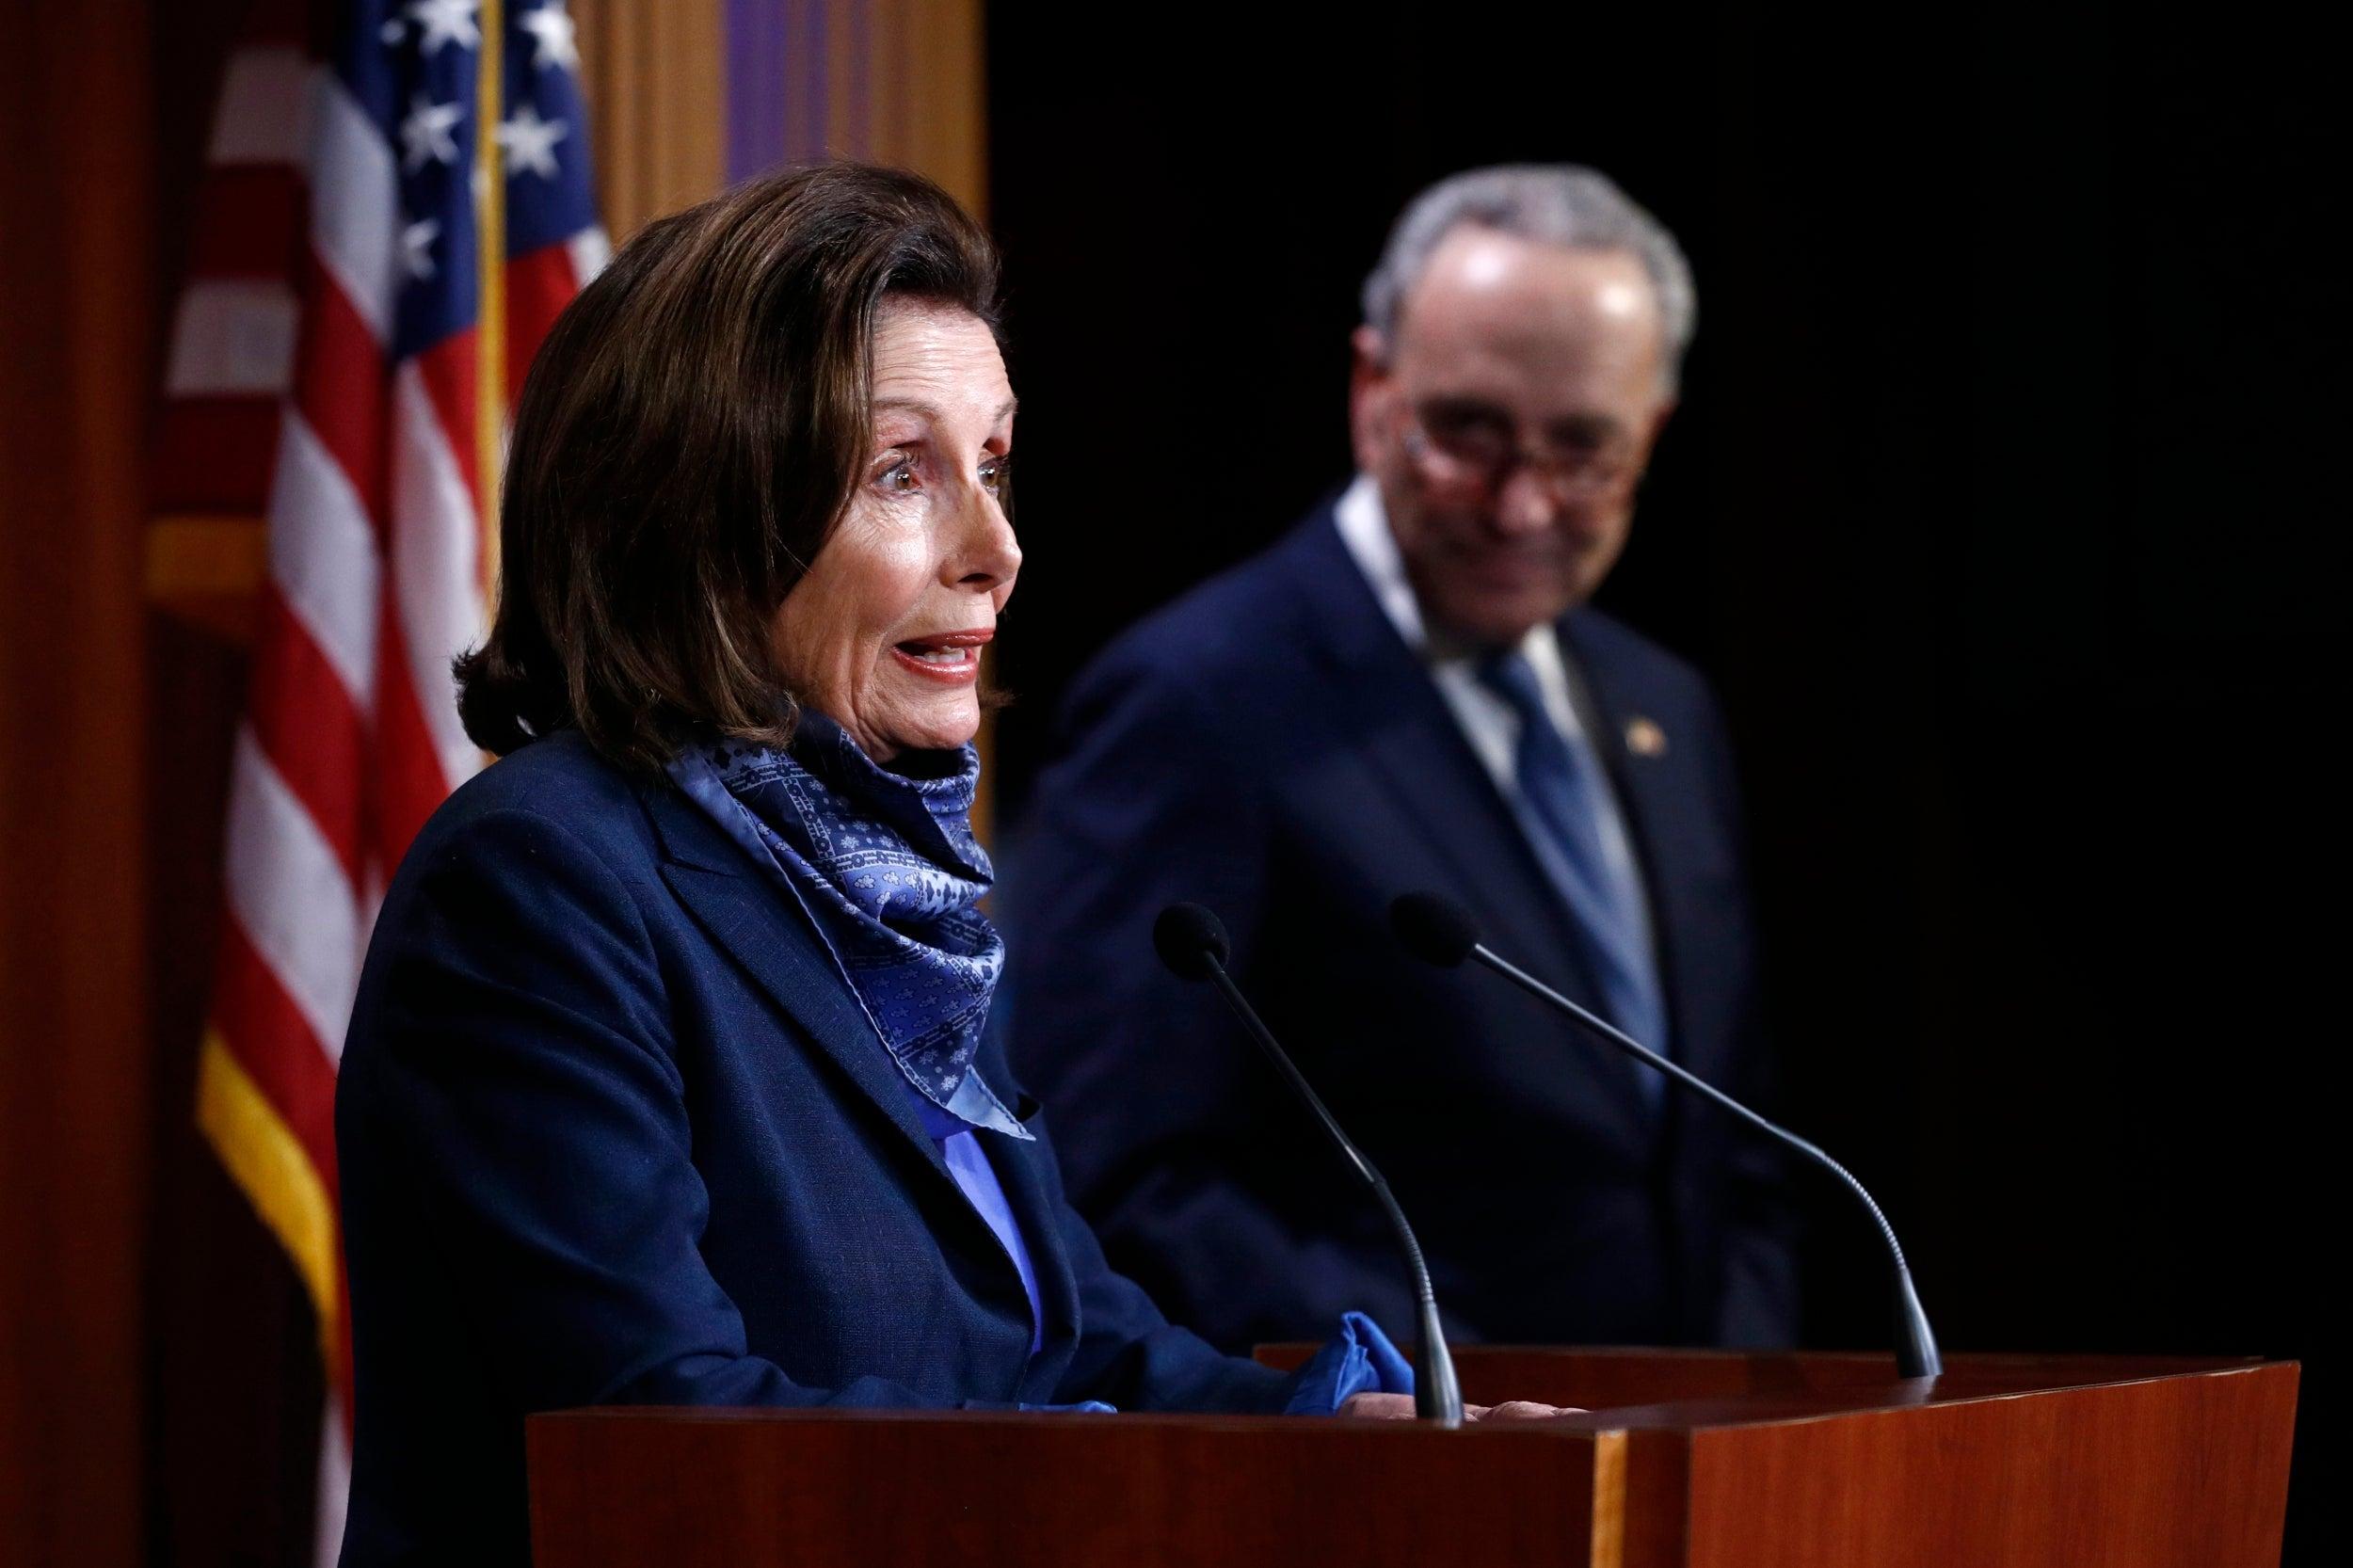 Coronavirus: Democrats send letter to Trump demanding flags fly at half mast when US hits 100,000 deaths